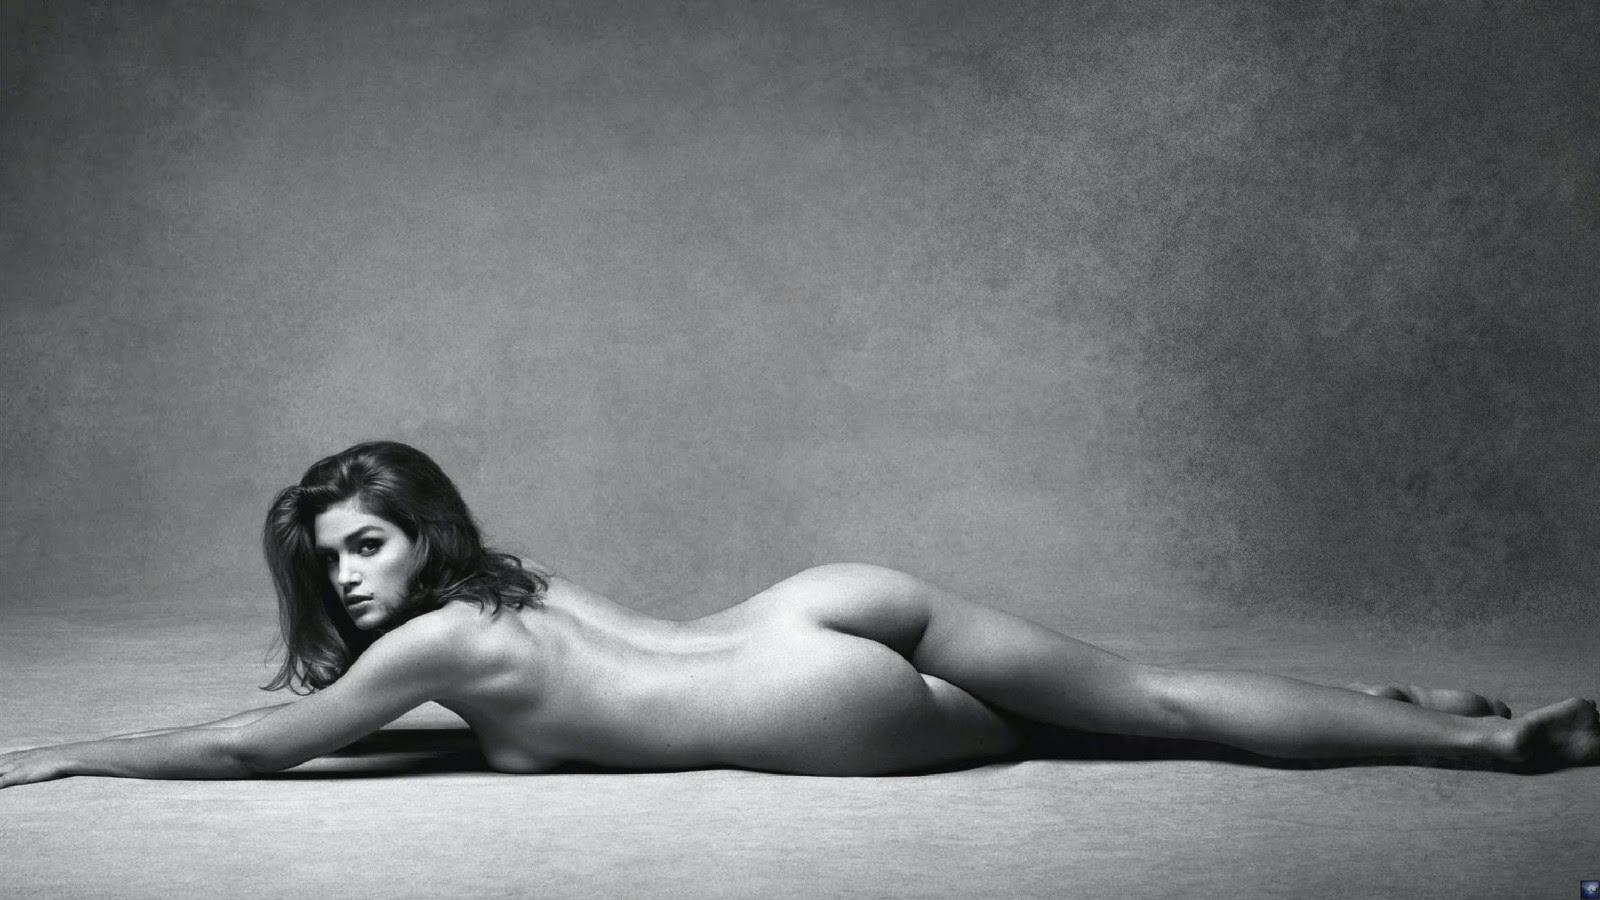 cindy crawford nude video